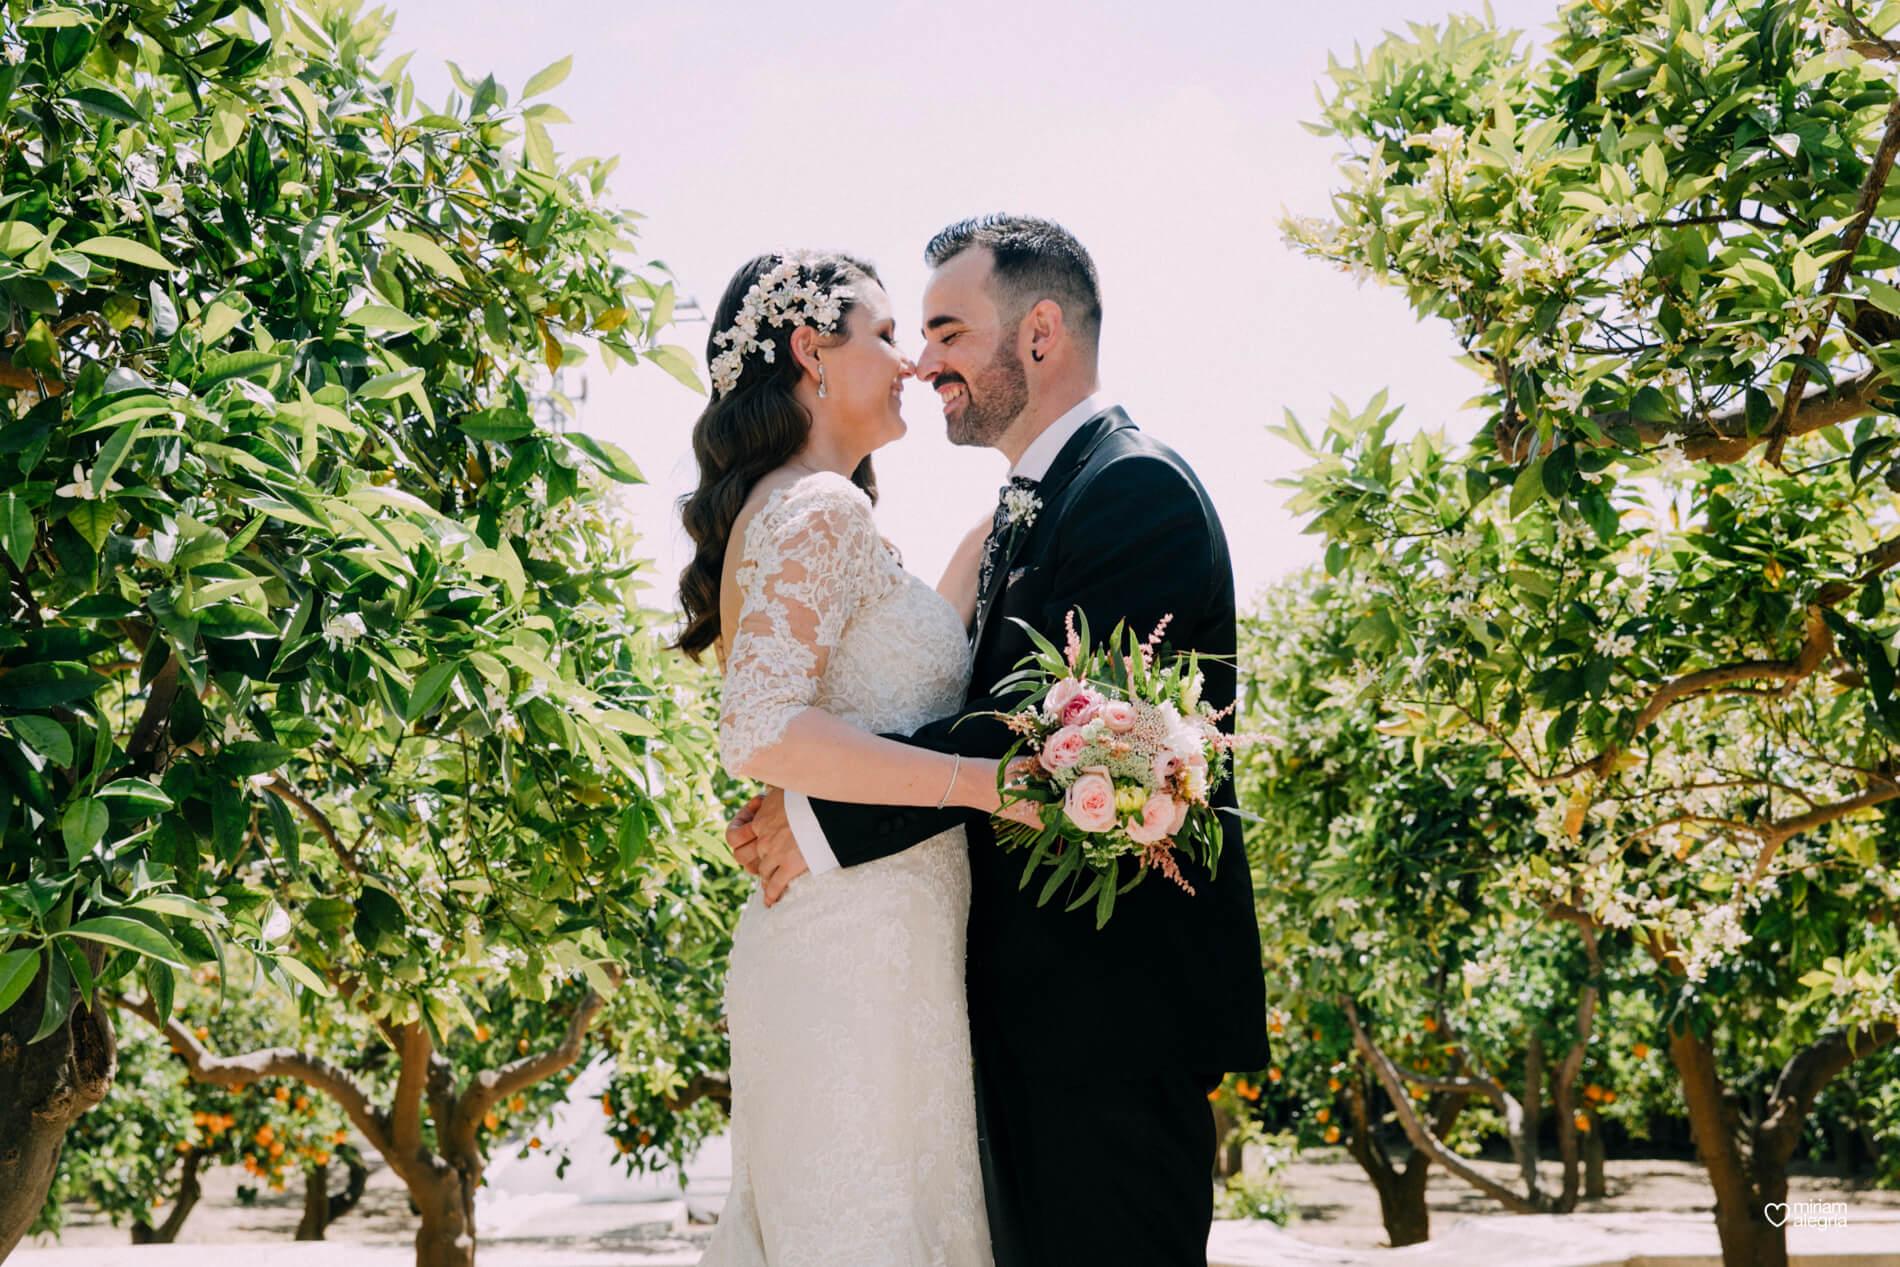 boda-en-finca-jurosa-miriam-alegria-93